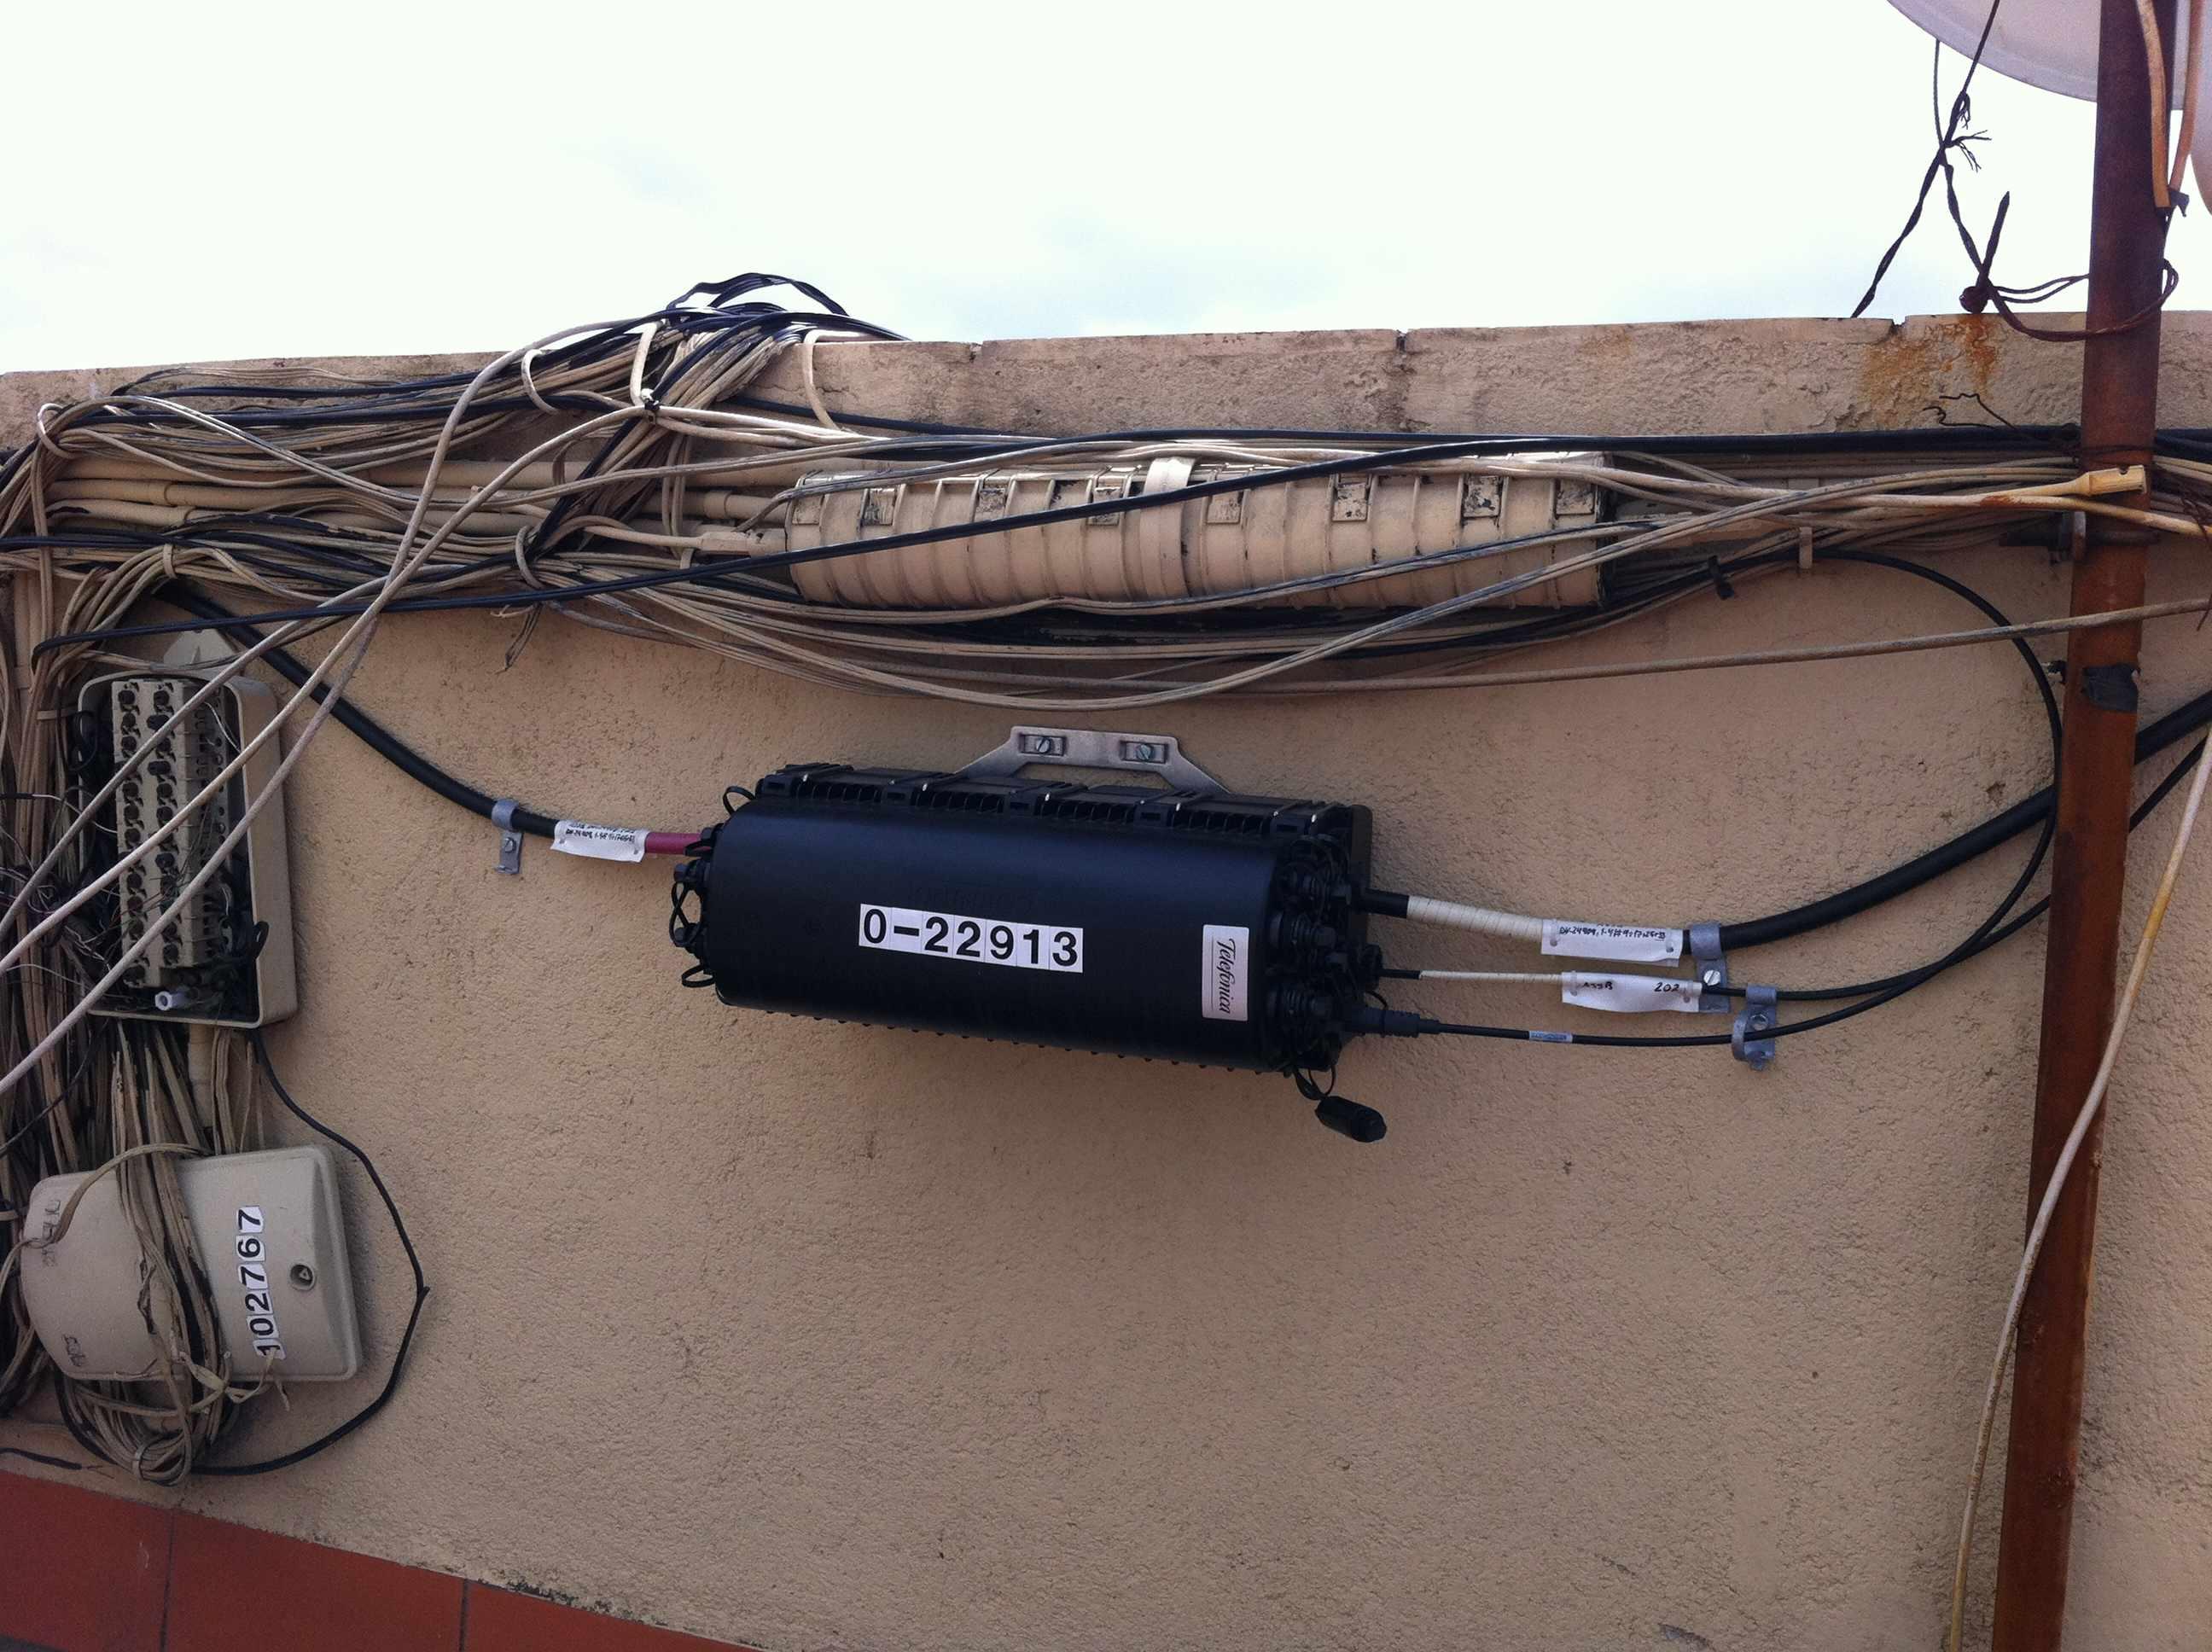 Solucionado disponibilidad de fibra ptica p gina 2 comunidad movistar - Fibra optica en casa ...